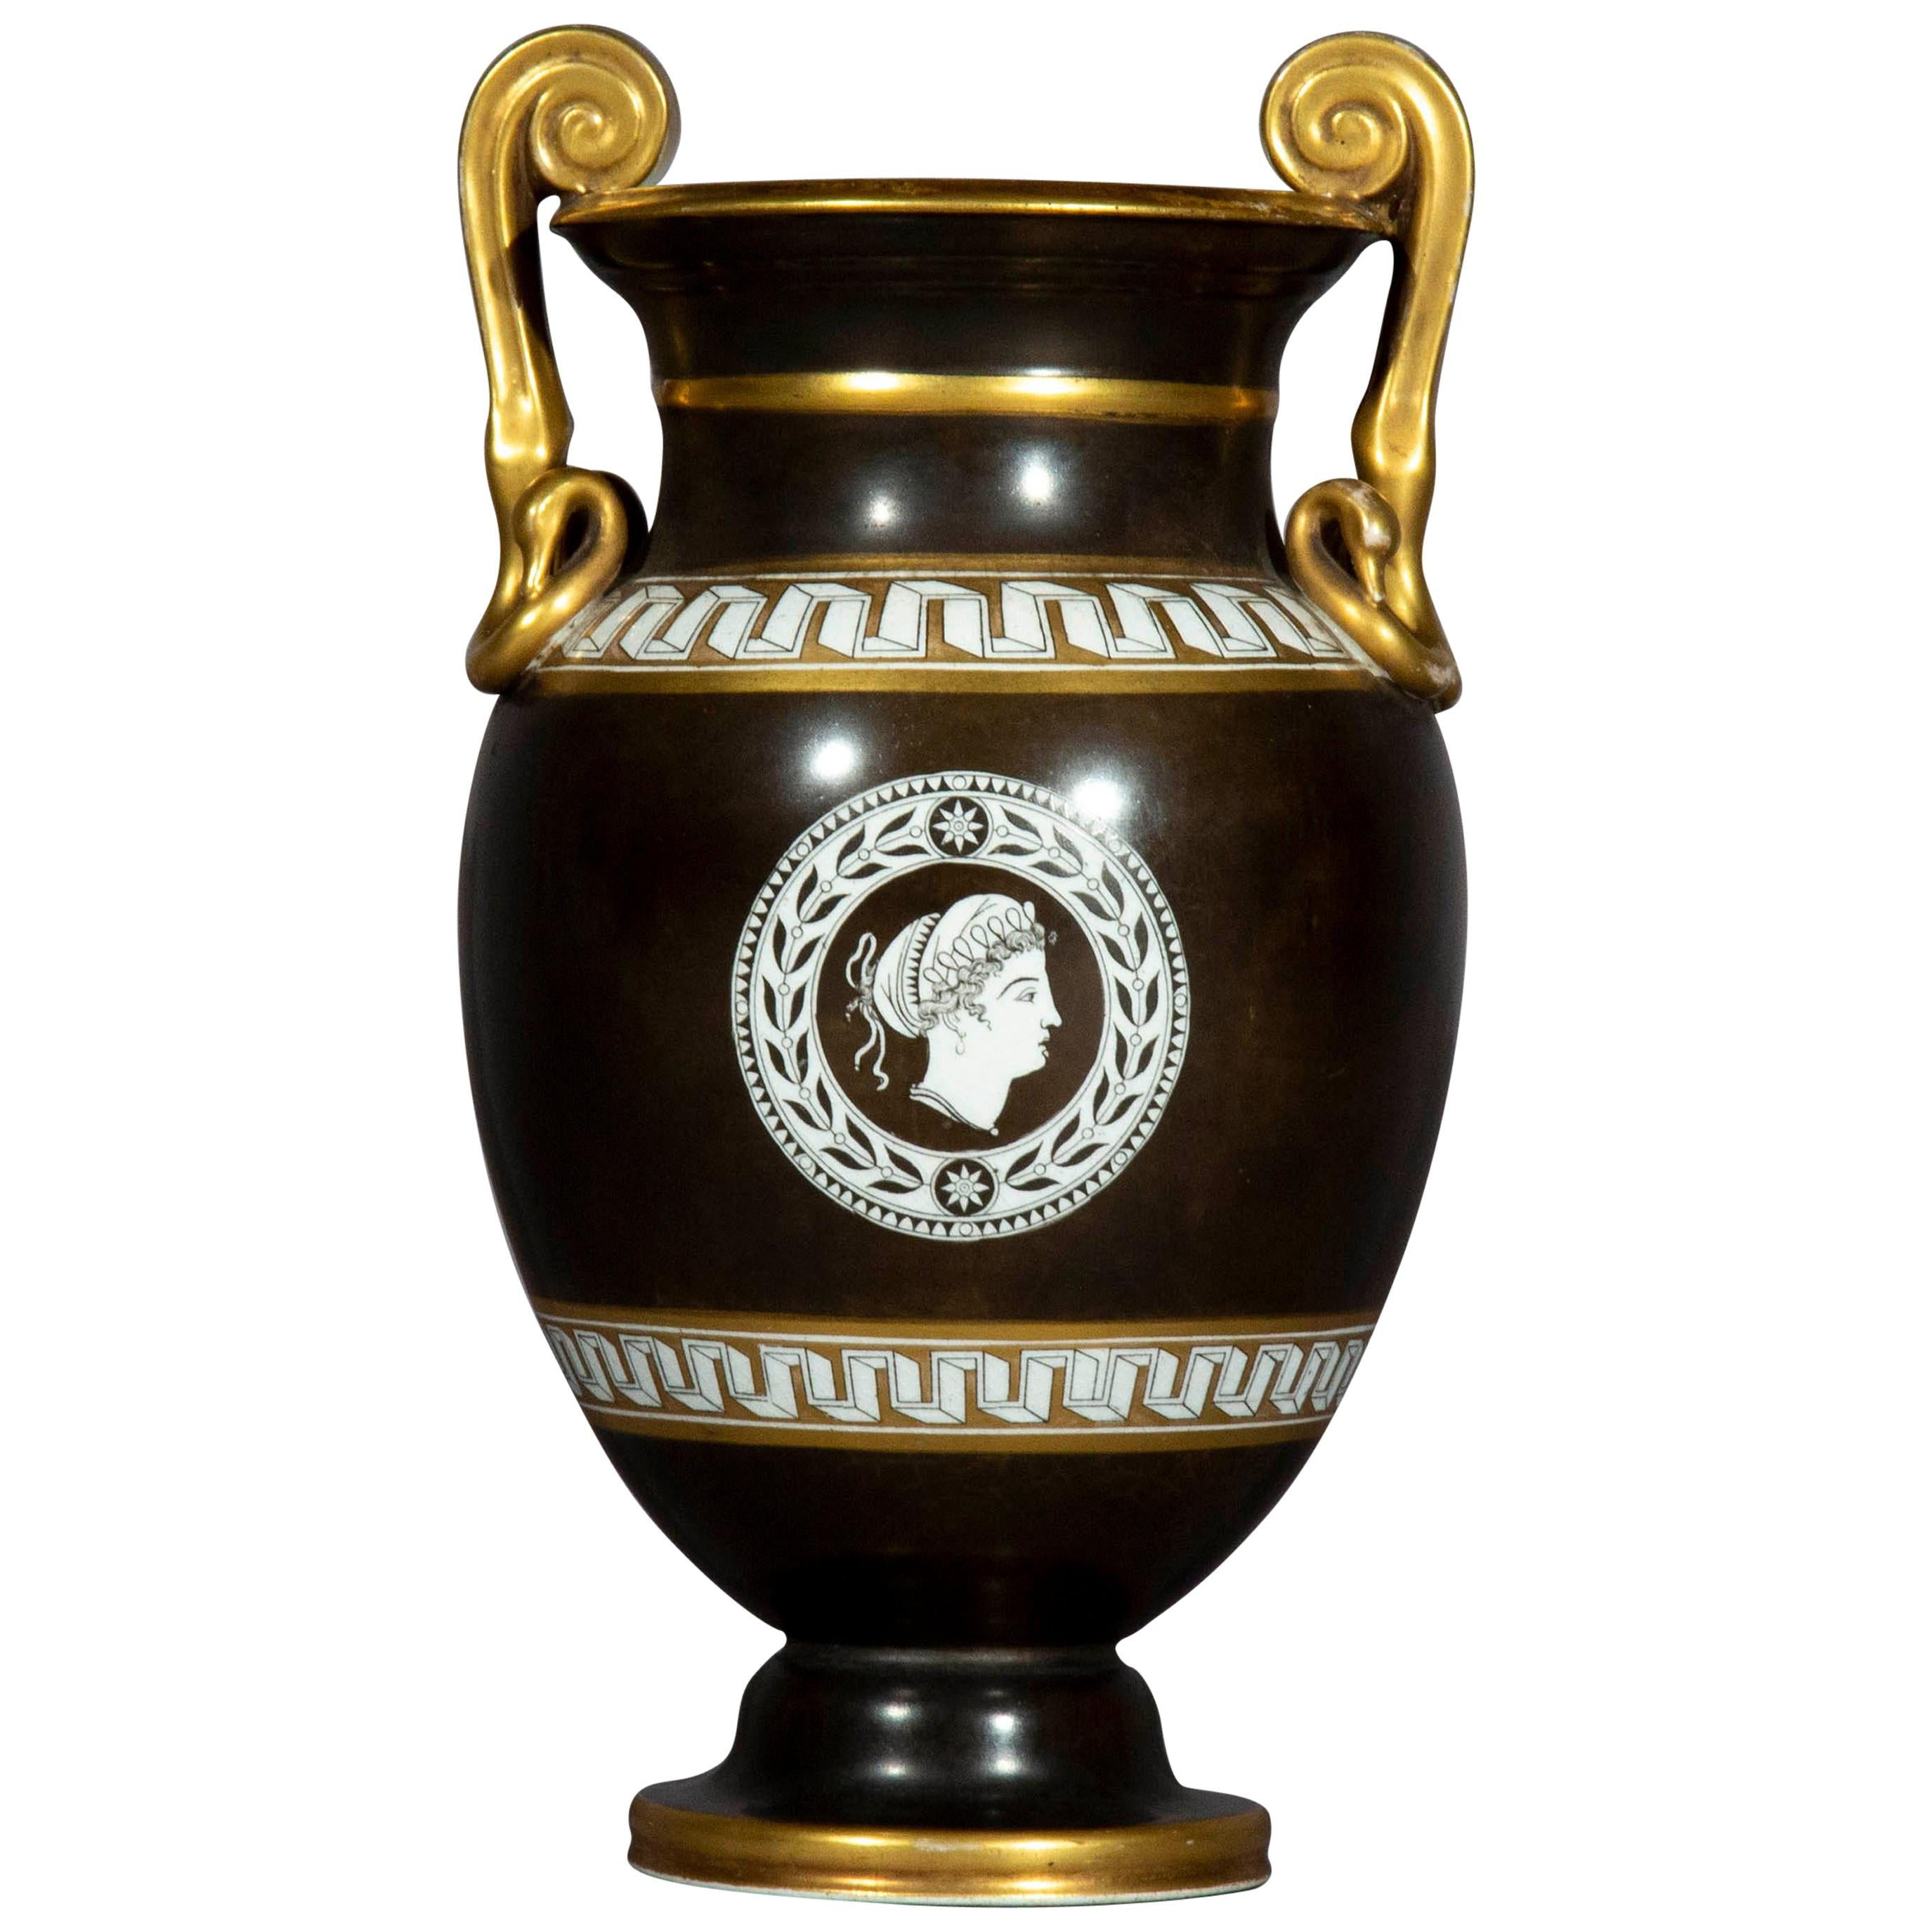 Antique Grand Tour Porcelain Vase, Early 19th Century